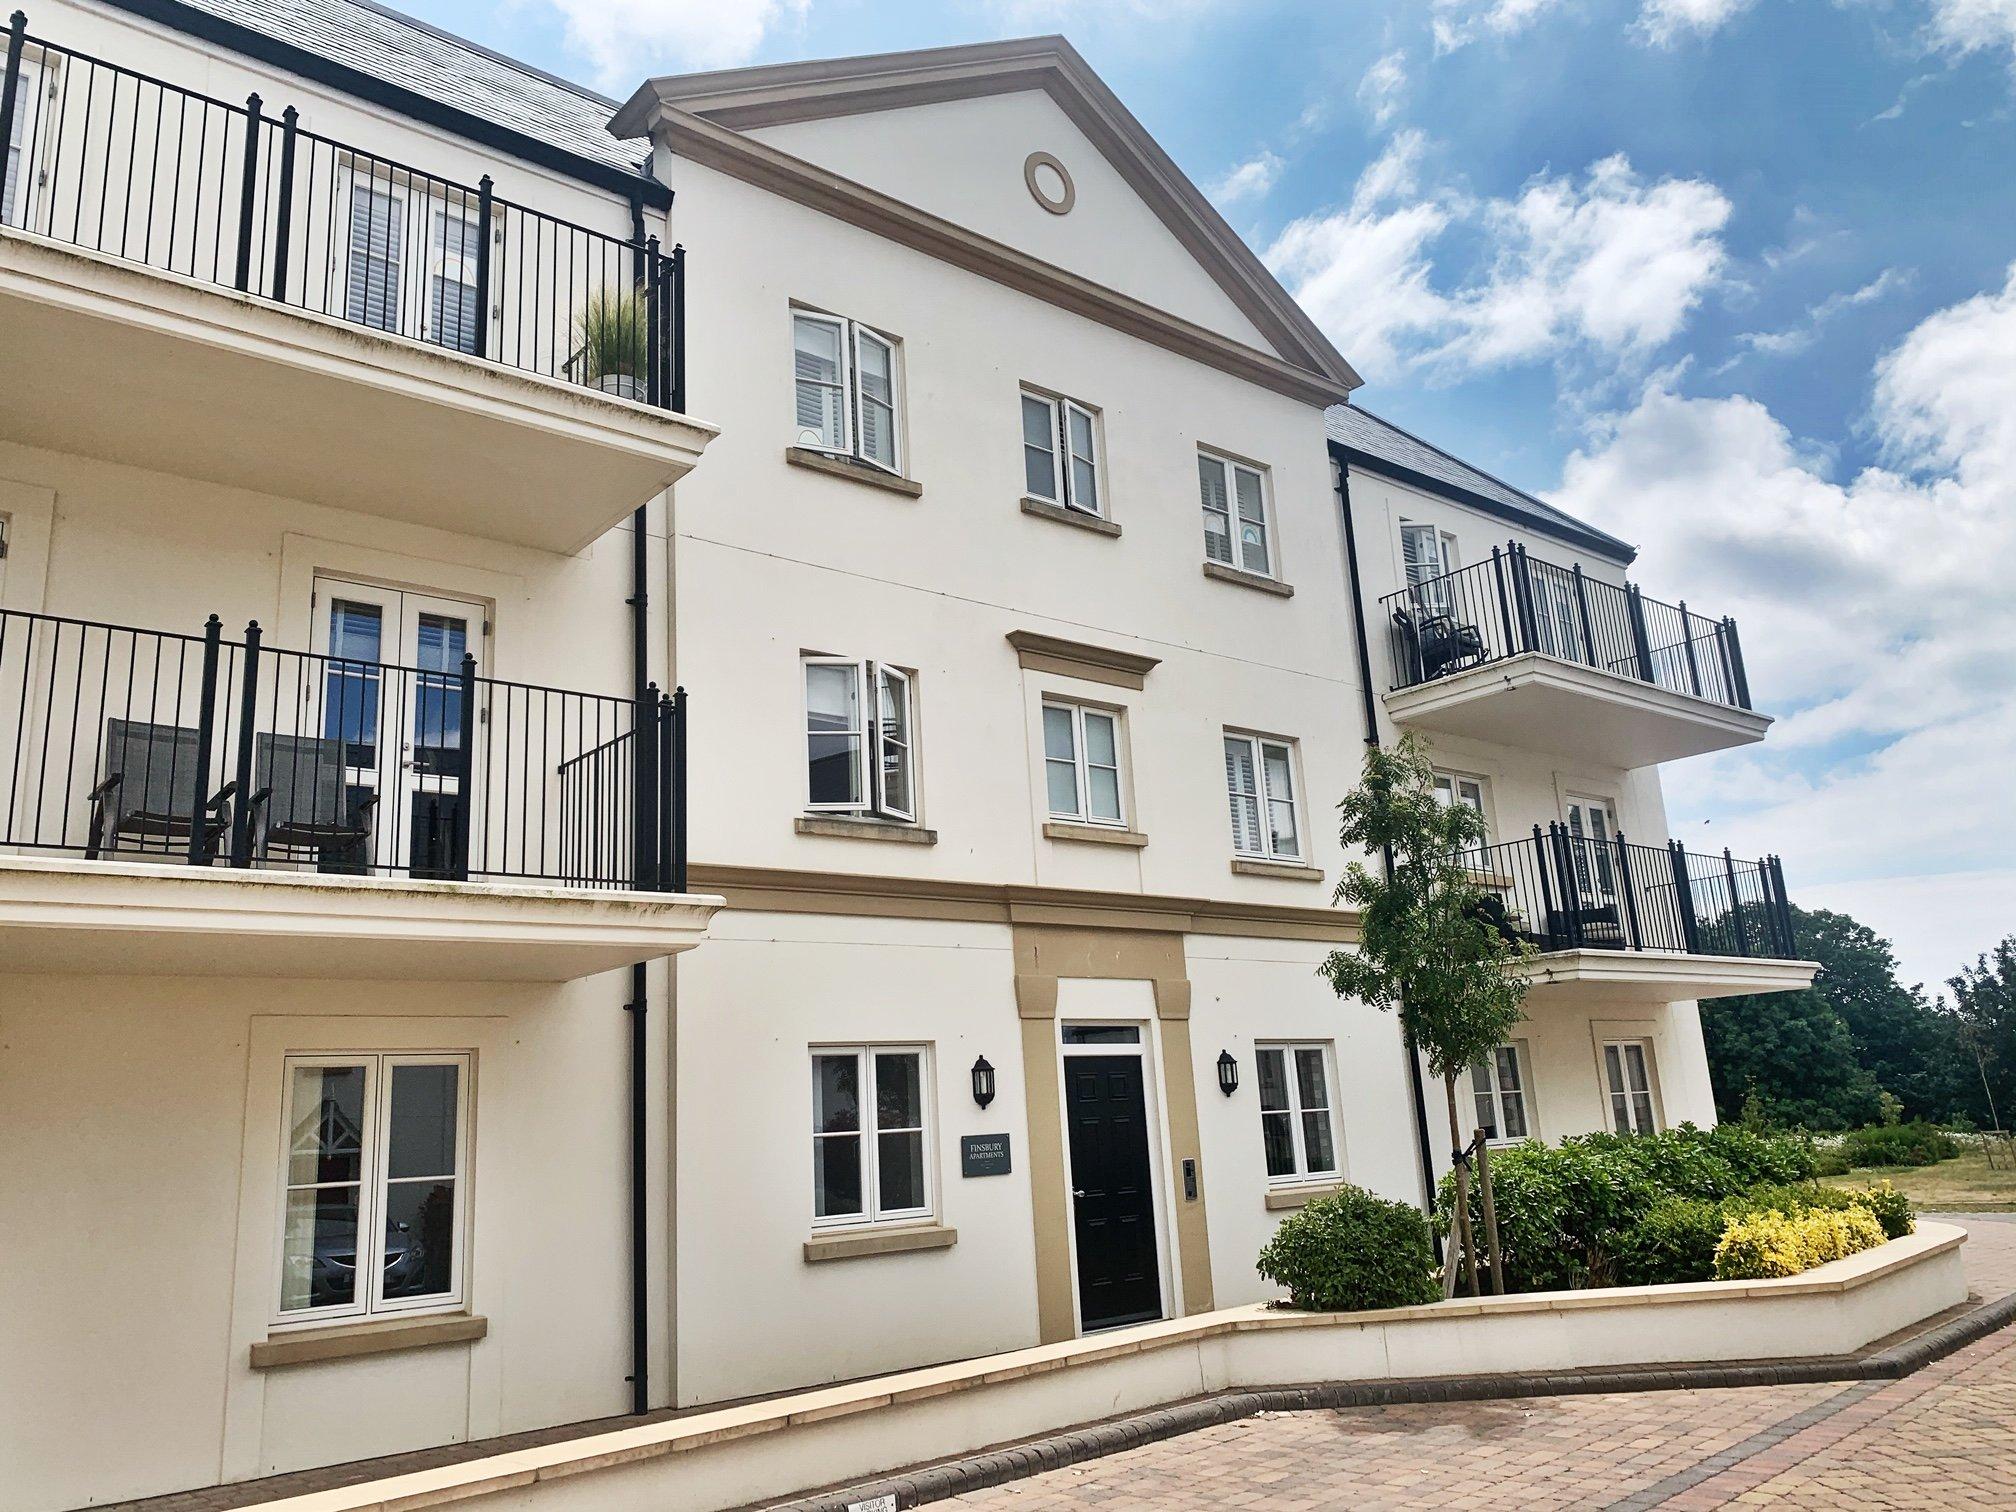 2 Bedroom, 2 Bathroom Ground Floor, Garden Apartment with Parking for 2, Finsbury Apartments